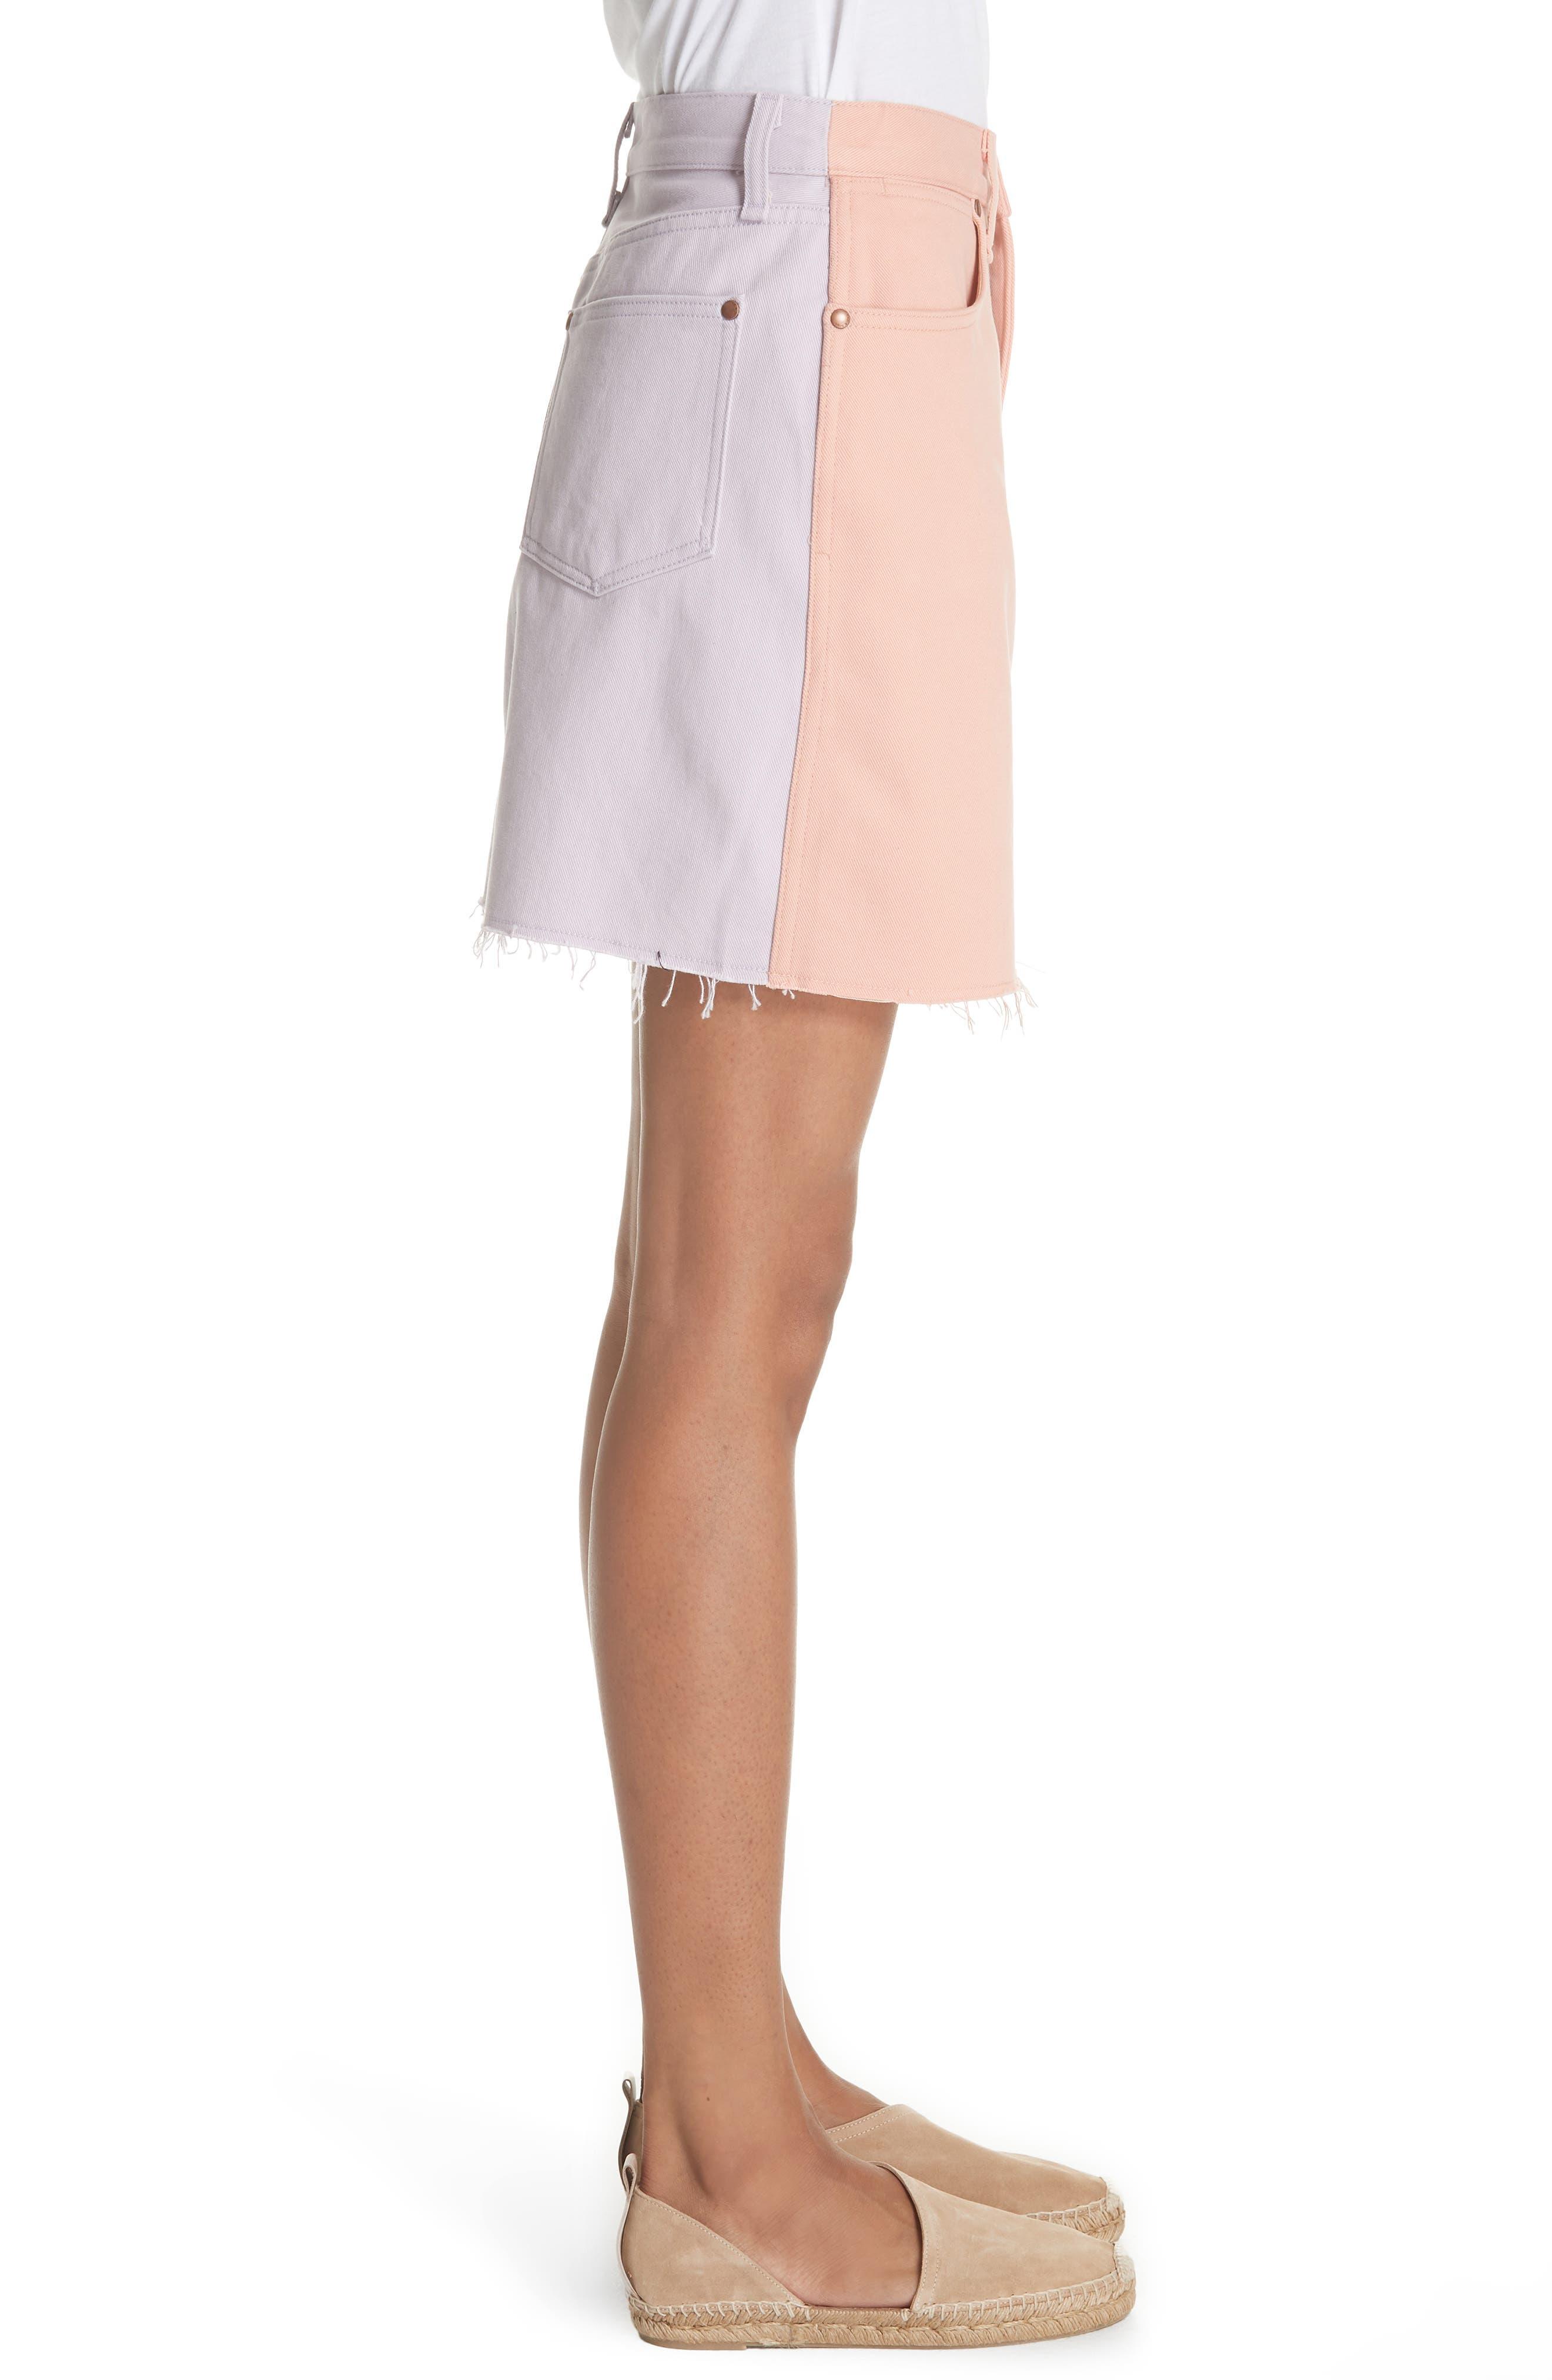 Moss Skirt,                             Alternate thumbnail 3, color,                             Peach/ Lilac